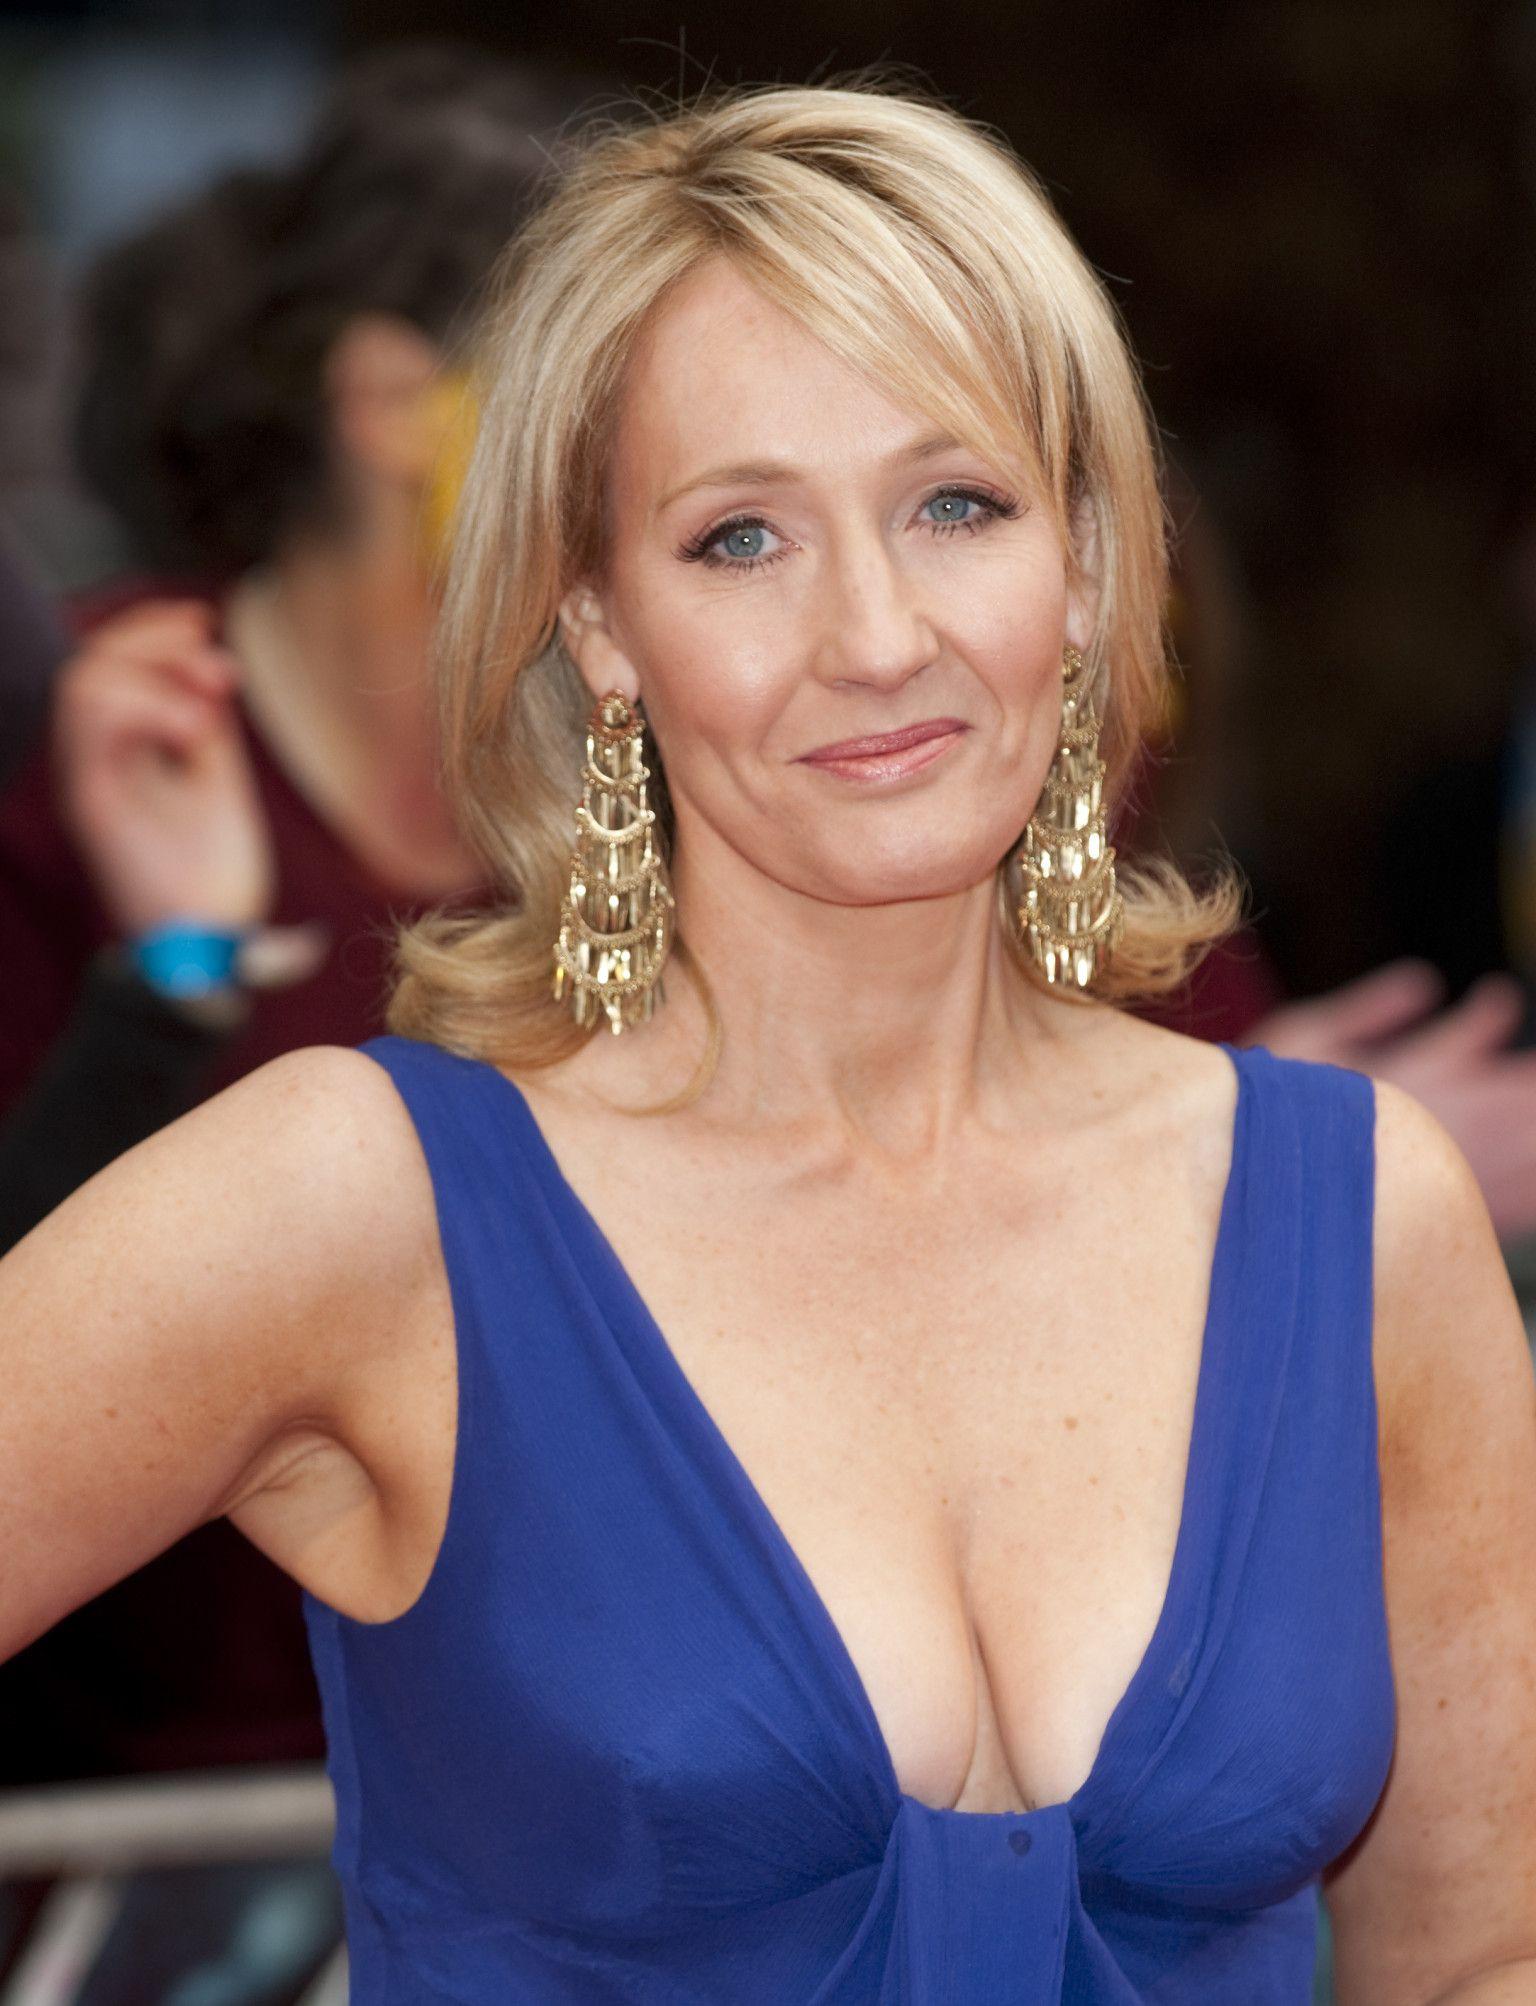 British porn actress star on her butt